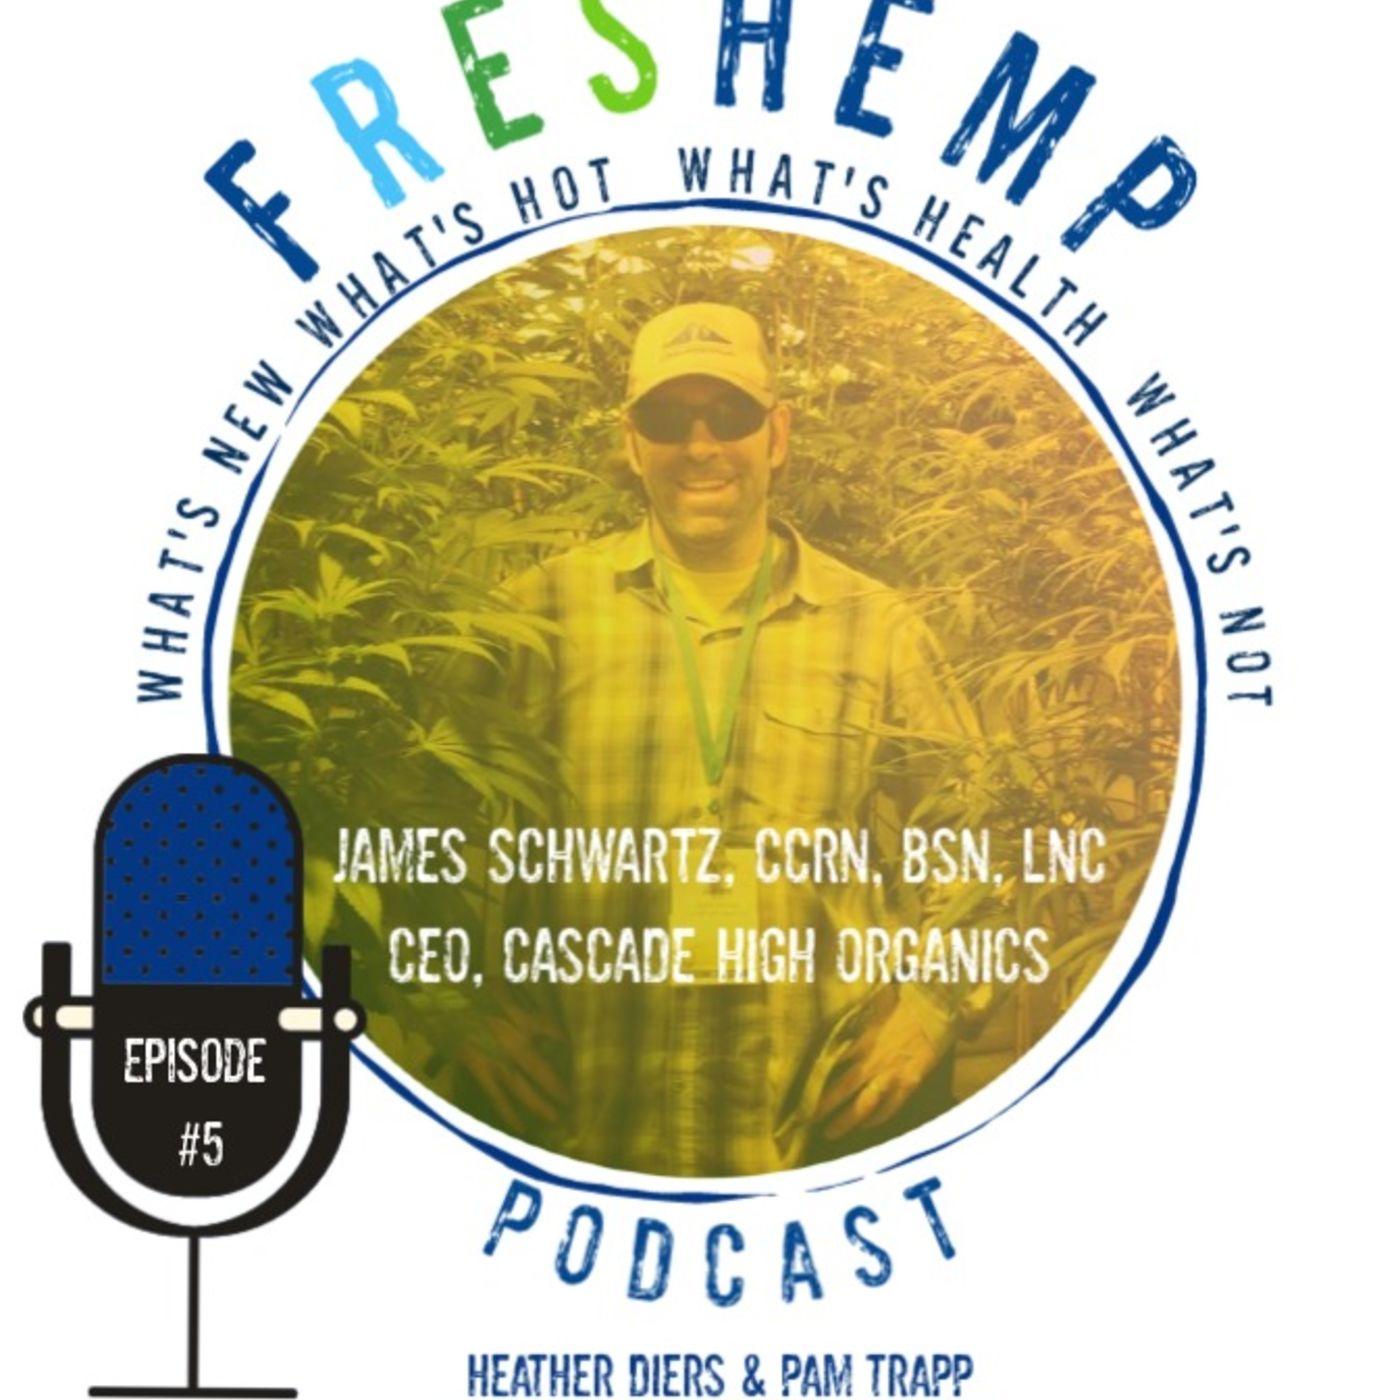 Growing to Heal - James Schwartz CCRN, BSN, LNC  CEO of Cascade High | Sustainable Organic Grower